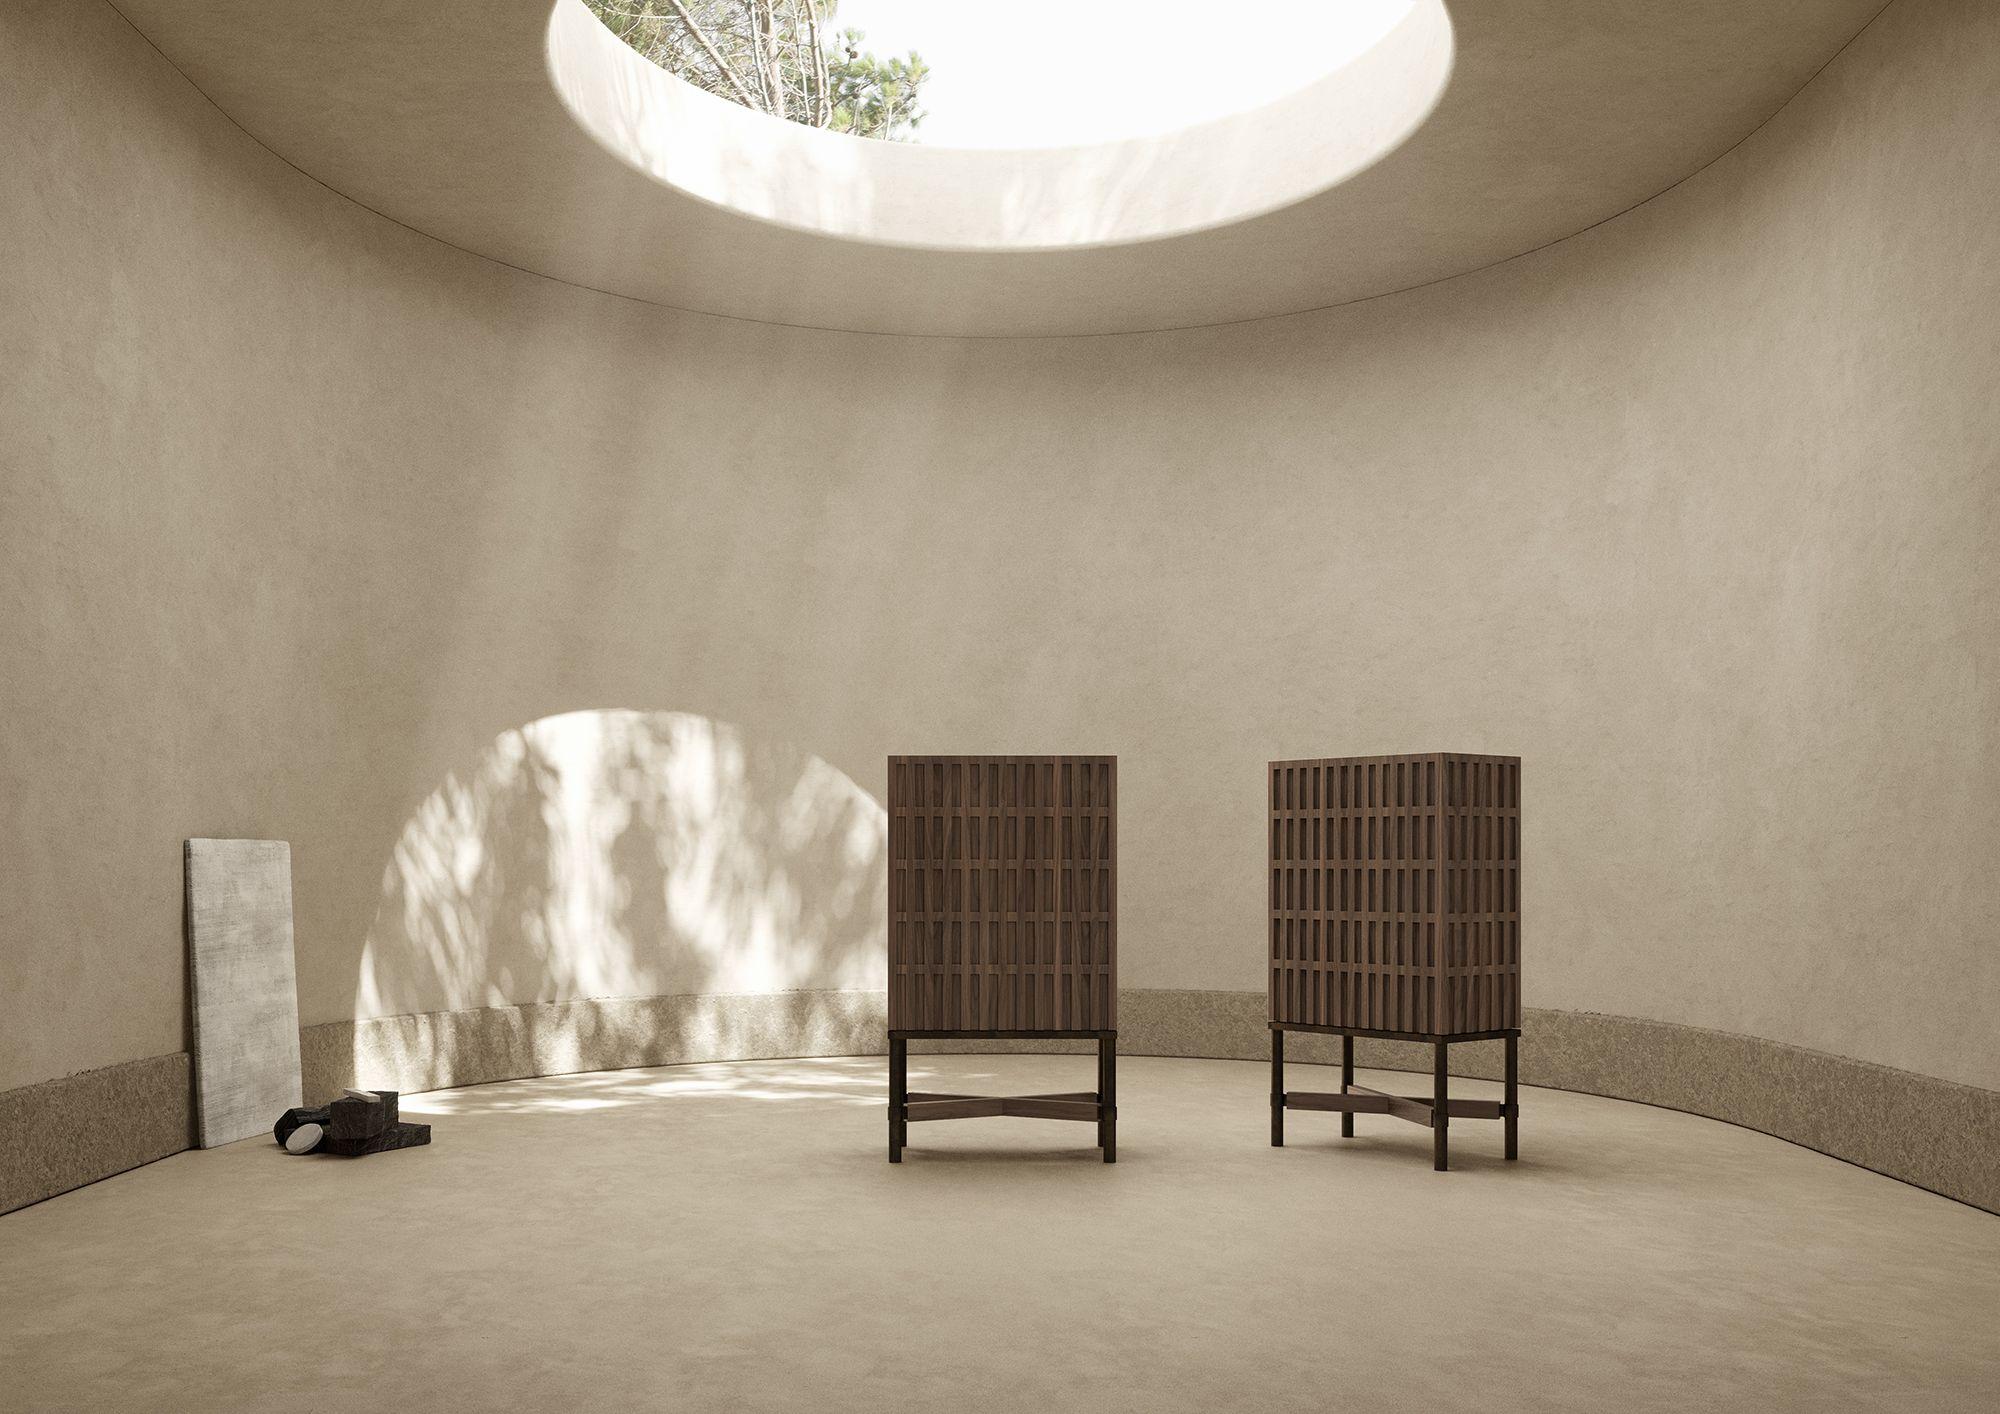 #notooSTUDIO For Nicolò Spinelli • #nottoolate #design #nicolospinelli #architecturallusions • Budriott by @nicolospinelli • #work #light #interiordesign #art #architecture #paciarott #furniture #colors #3d #3drender #coronarender #conceptdesign #styling #setdesign #artdirection #cinema4d #minimalism #materials #shapes #column #sphere #monumental